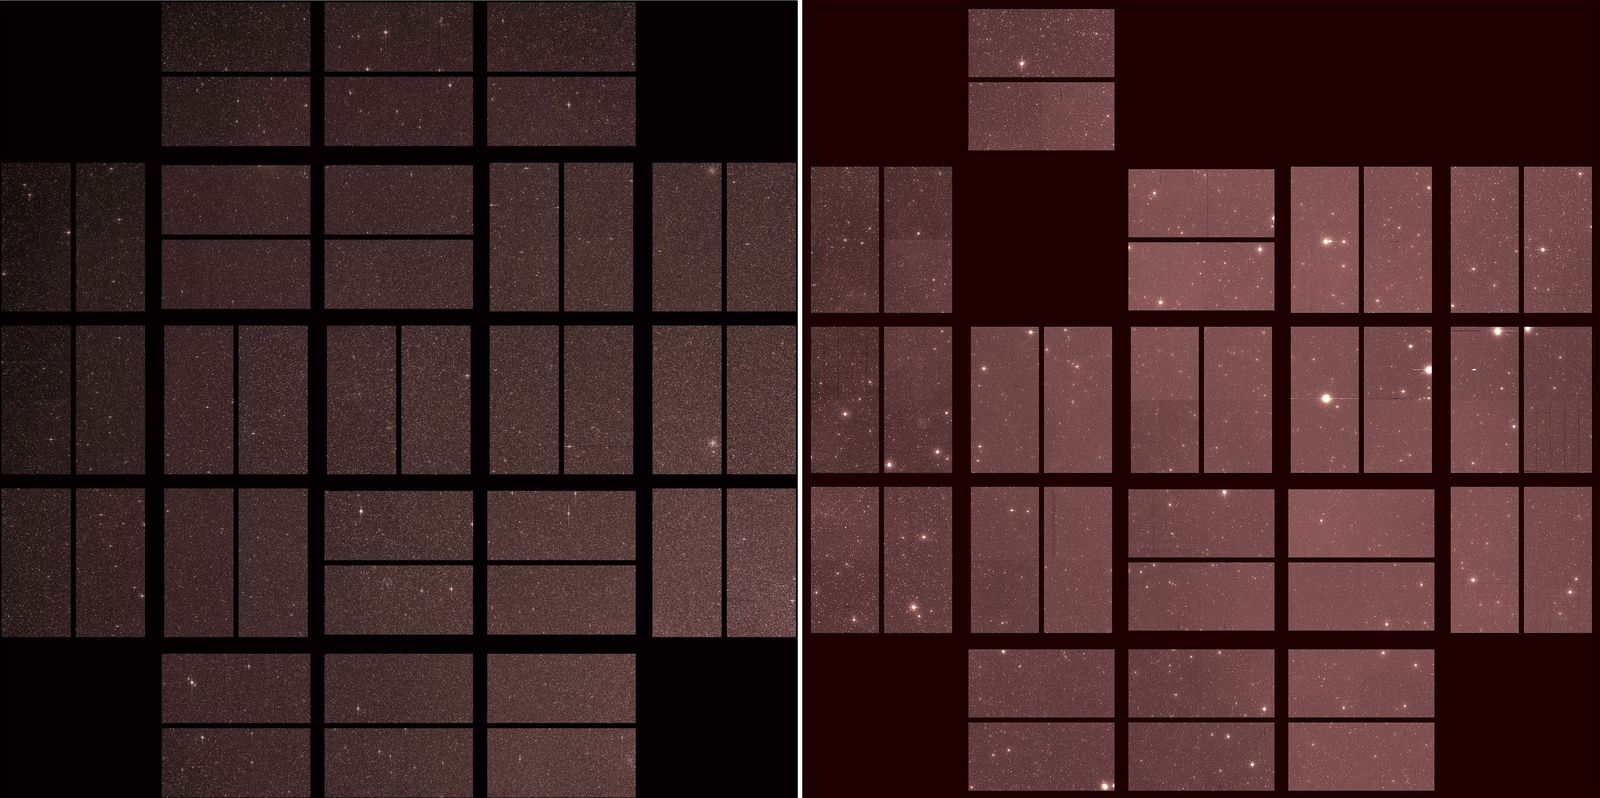 EINMALIGE VERWENDUNG Kepler